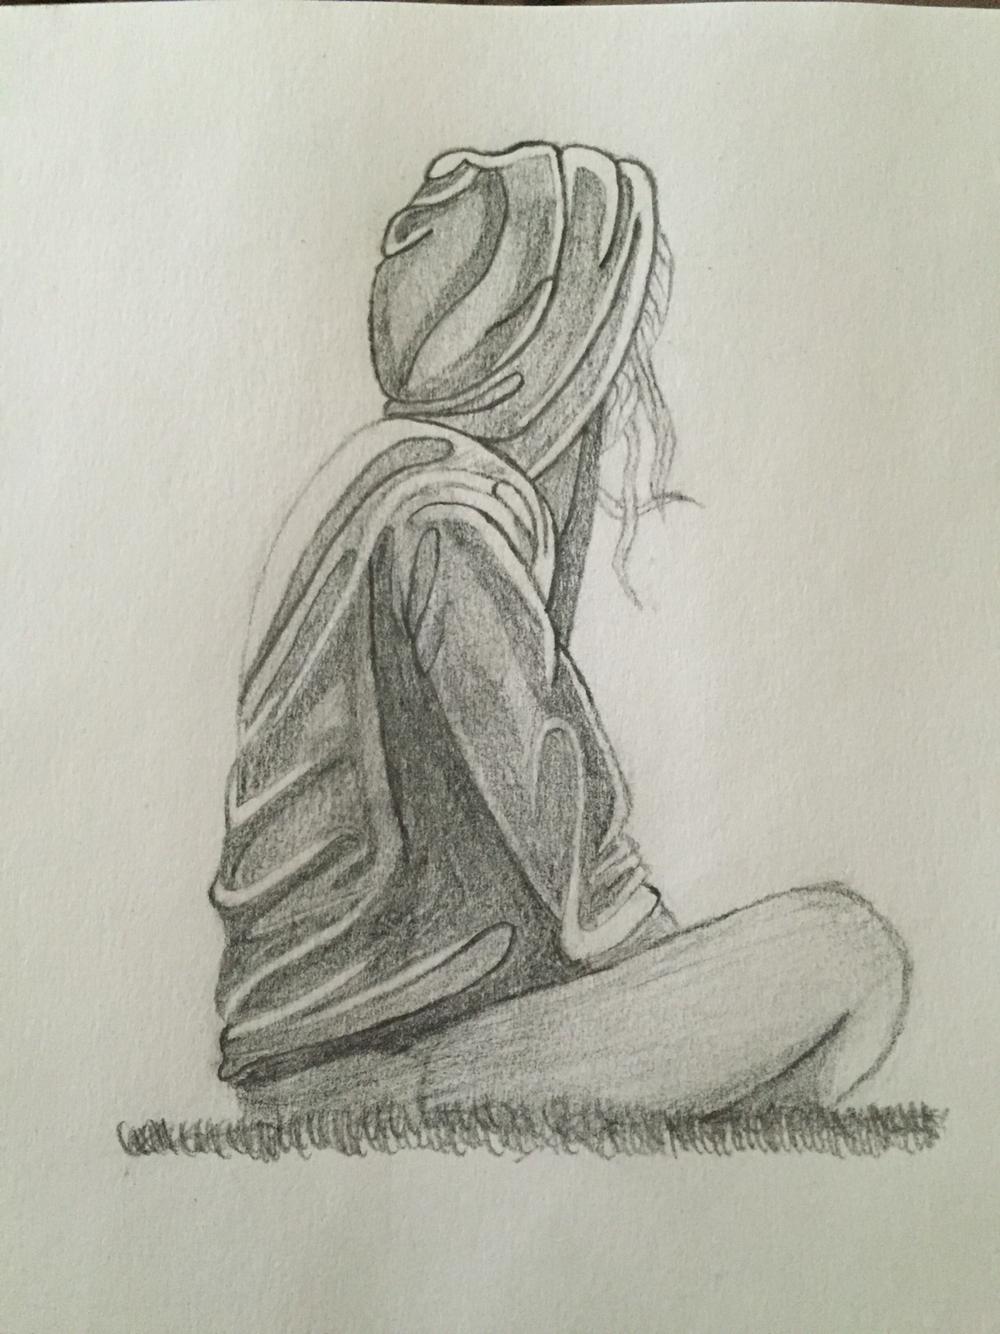 Drawn sad sad woman Tree pencil sketch … Search